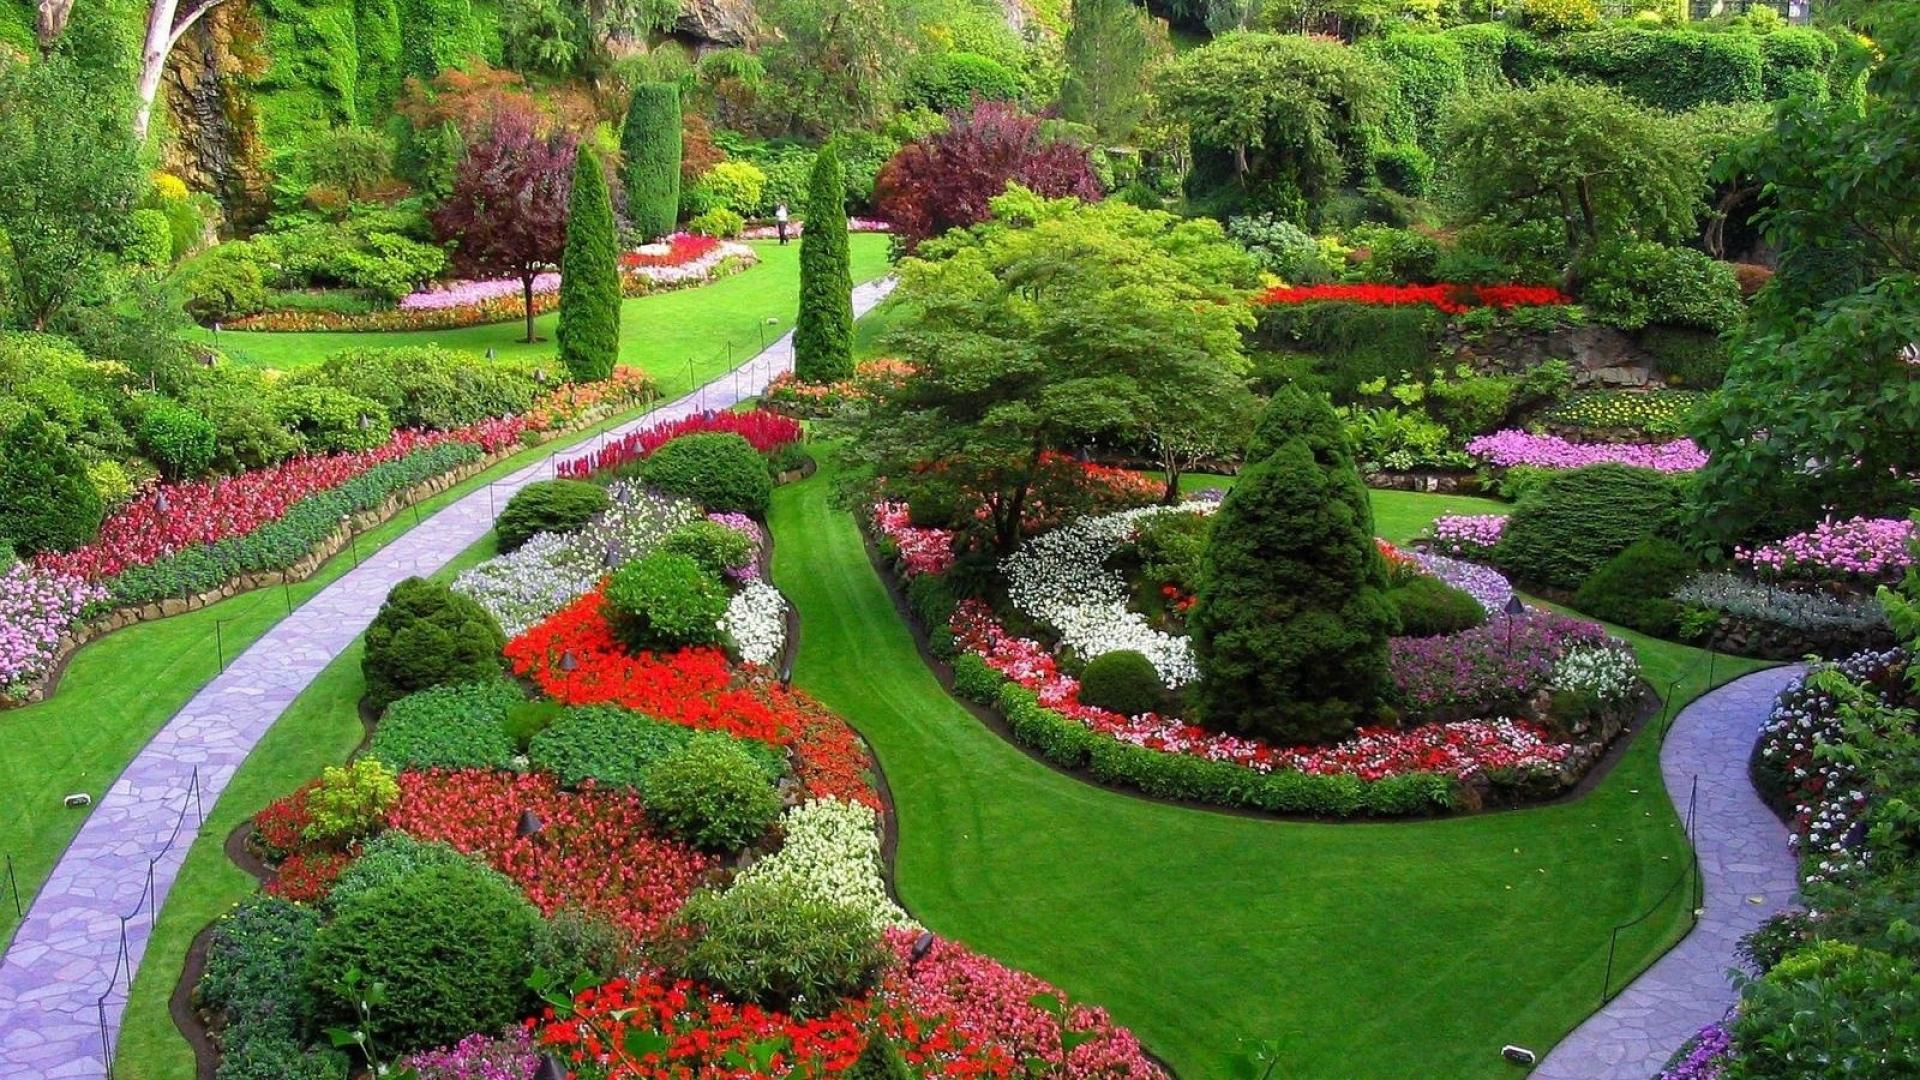 Marvelous Garden, Footpaths, Flowers